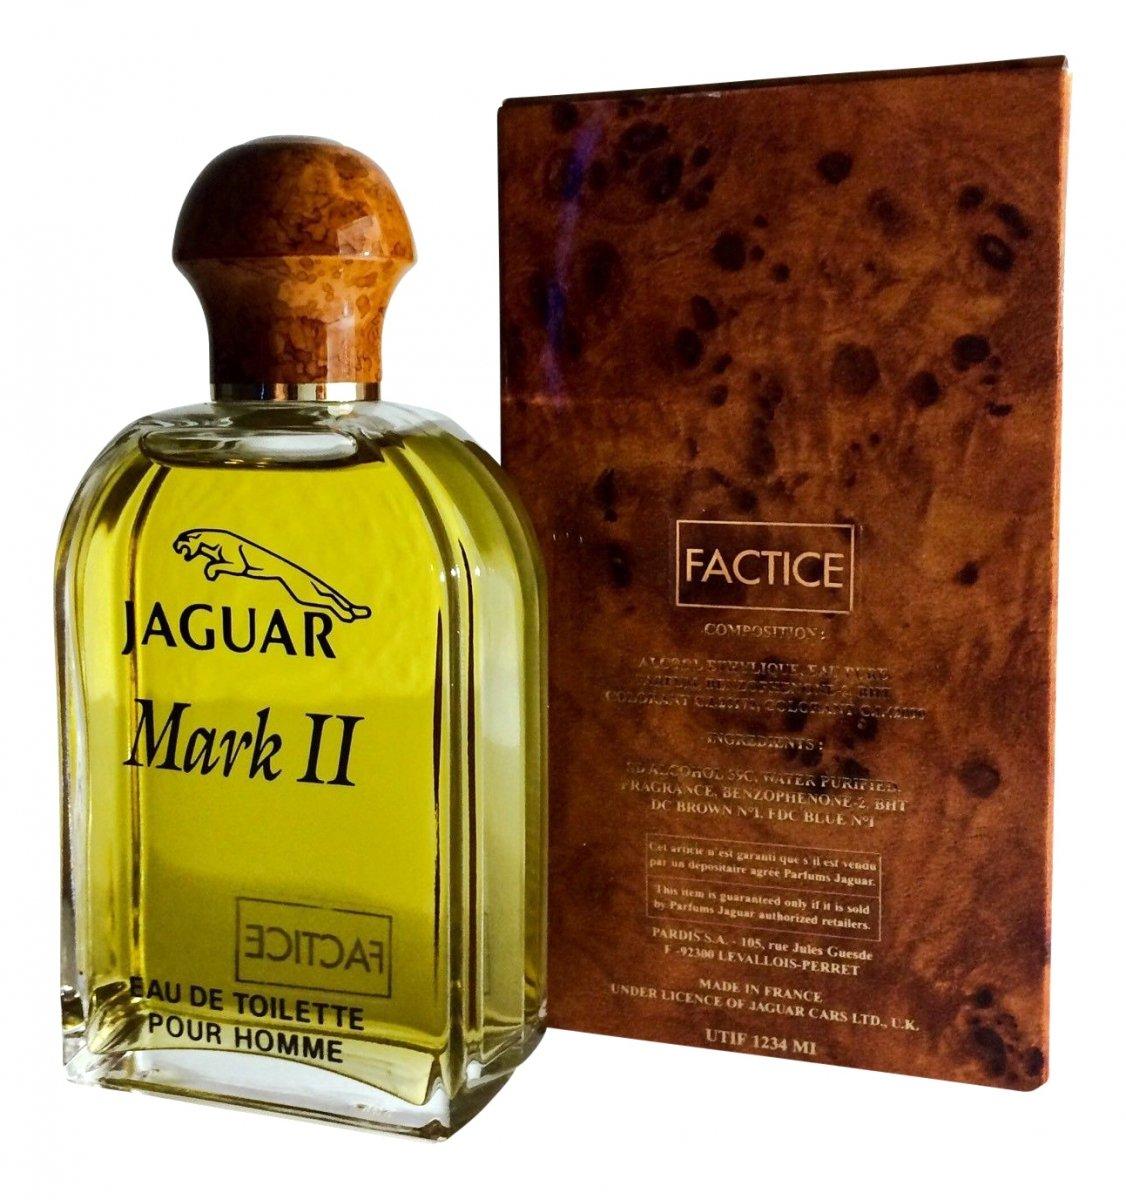 jaguar mark ii eau de toilette reviews and rating. Black Bedroom Furniture Sets. Home Design Ideas